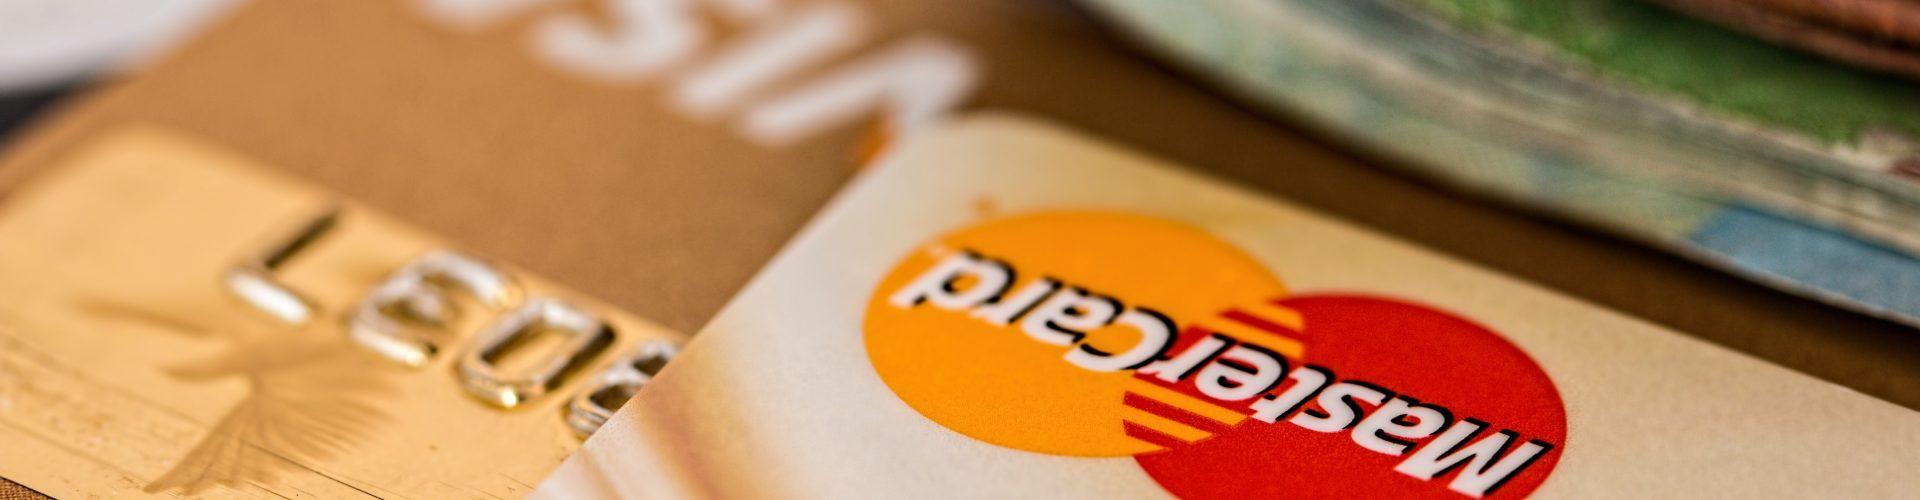 Credit Card vs Cash